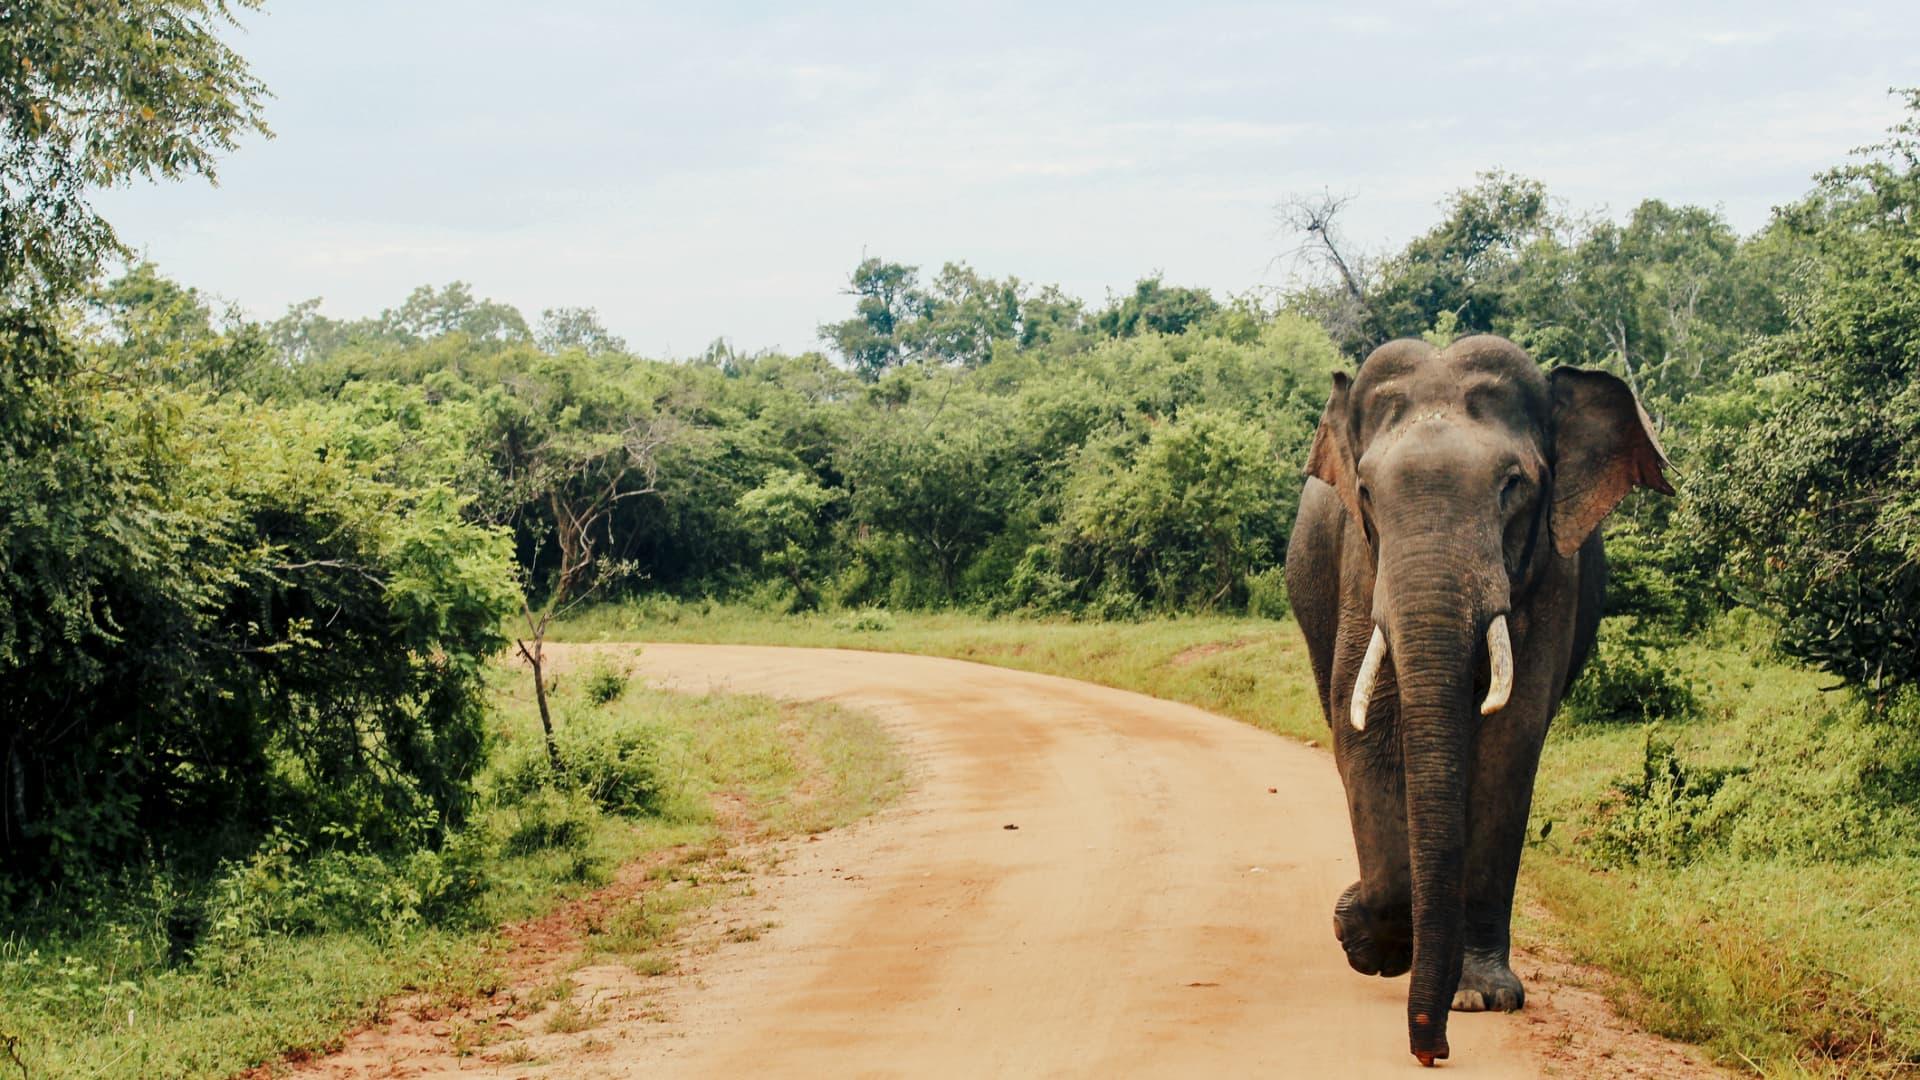 An Asian elephant walks along a dirt road at Yala National Park.